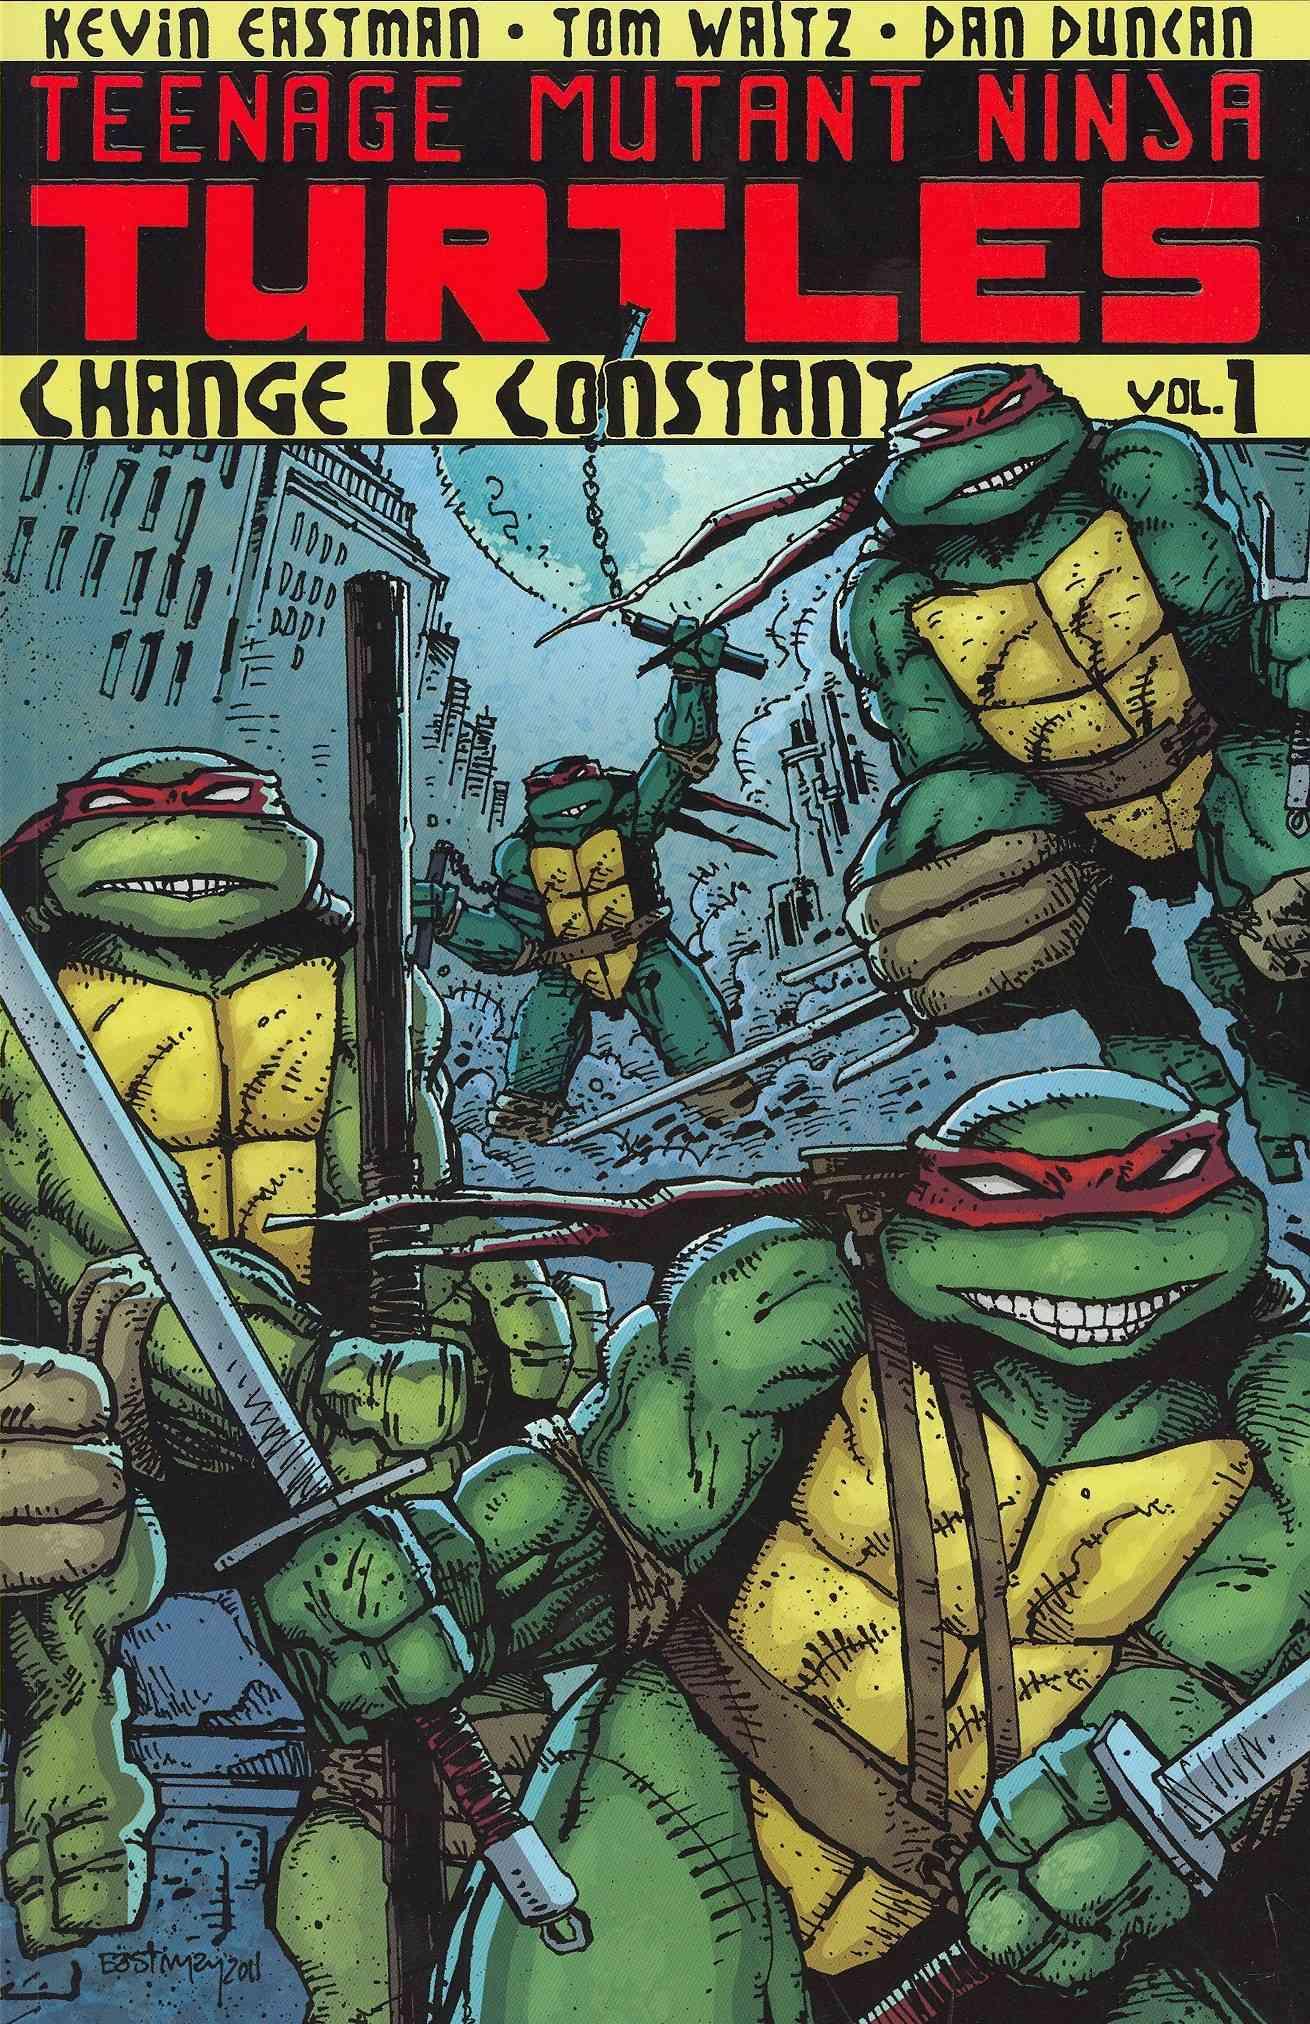 Teenage Mutant Ninja Turtles 1: Change Is Constant (Paperback)